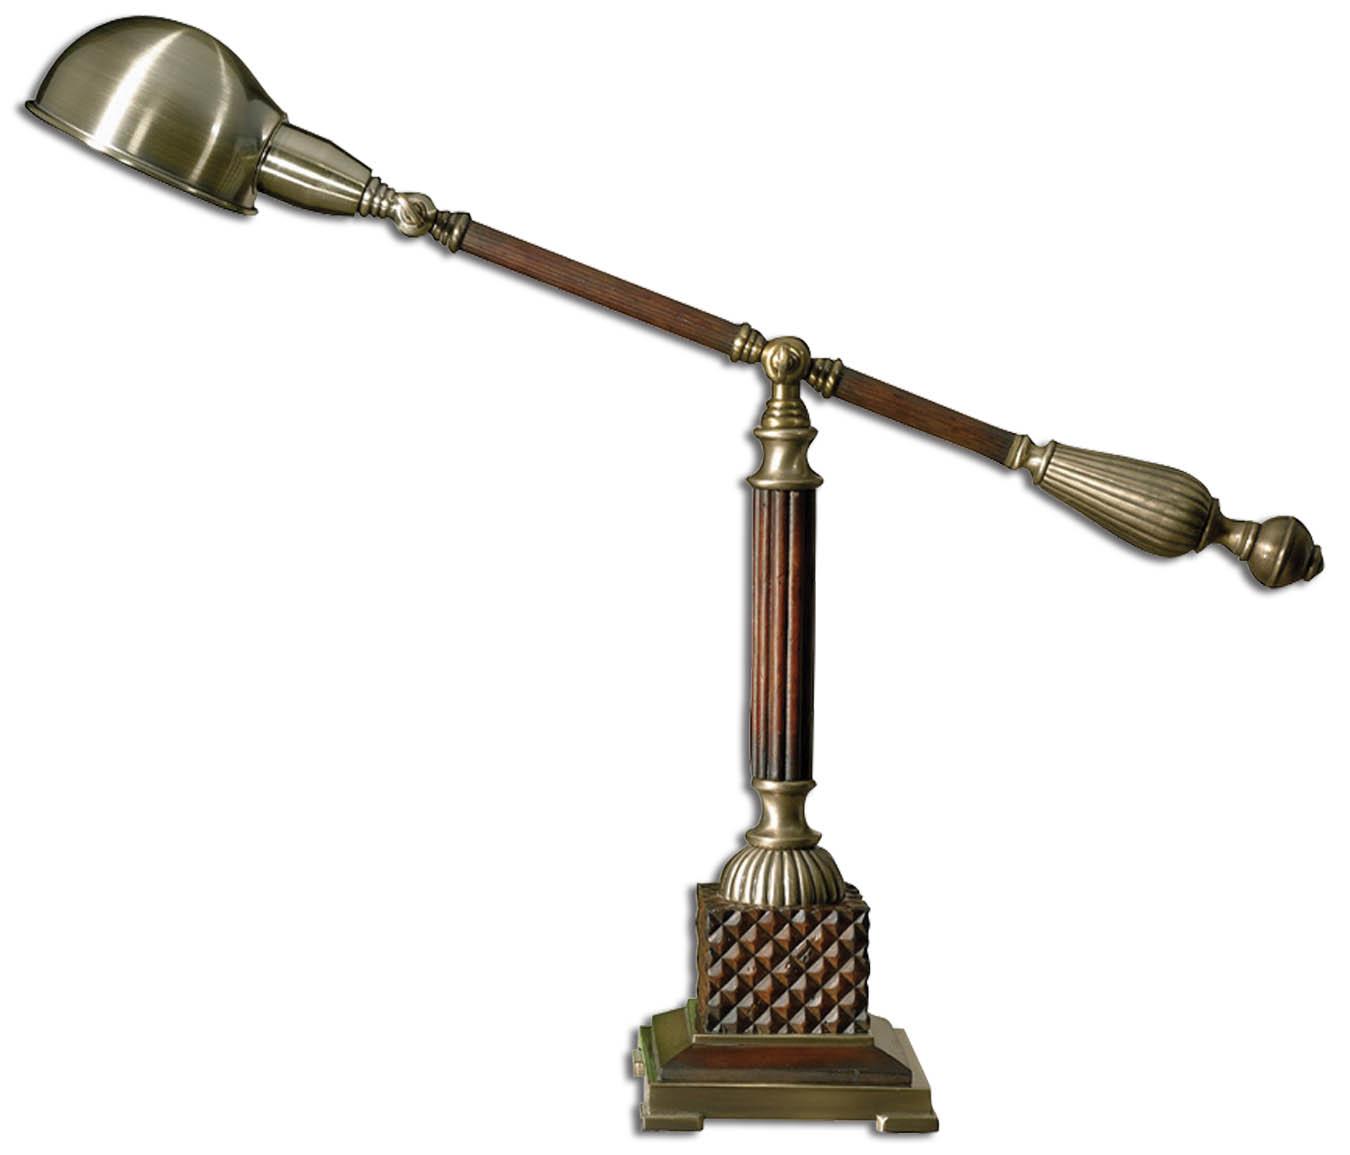 Uttermost 29425-1 Dalton Wood Desk Lamp